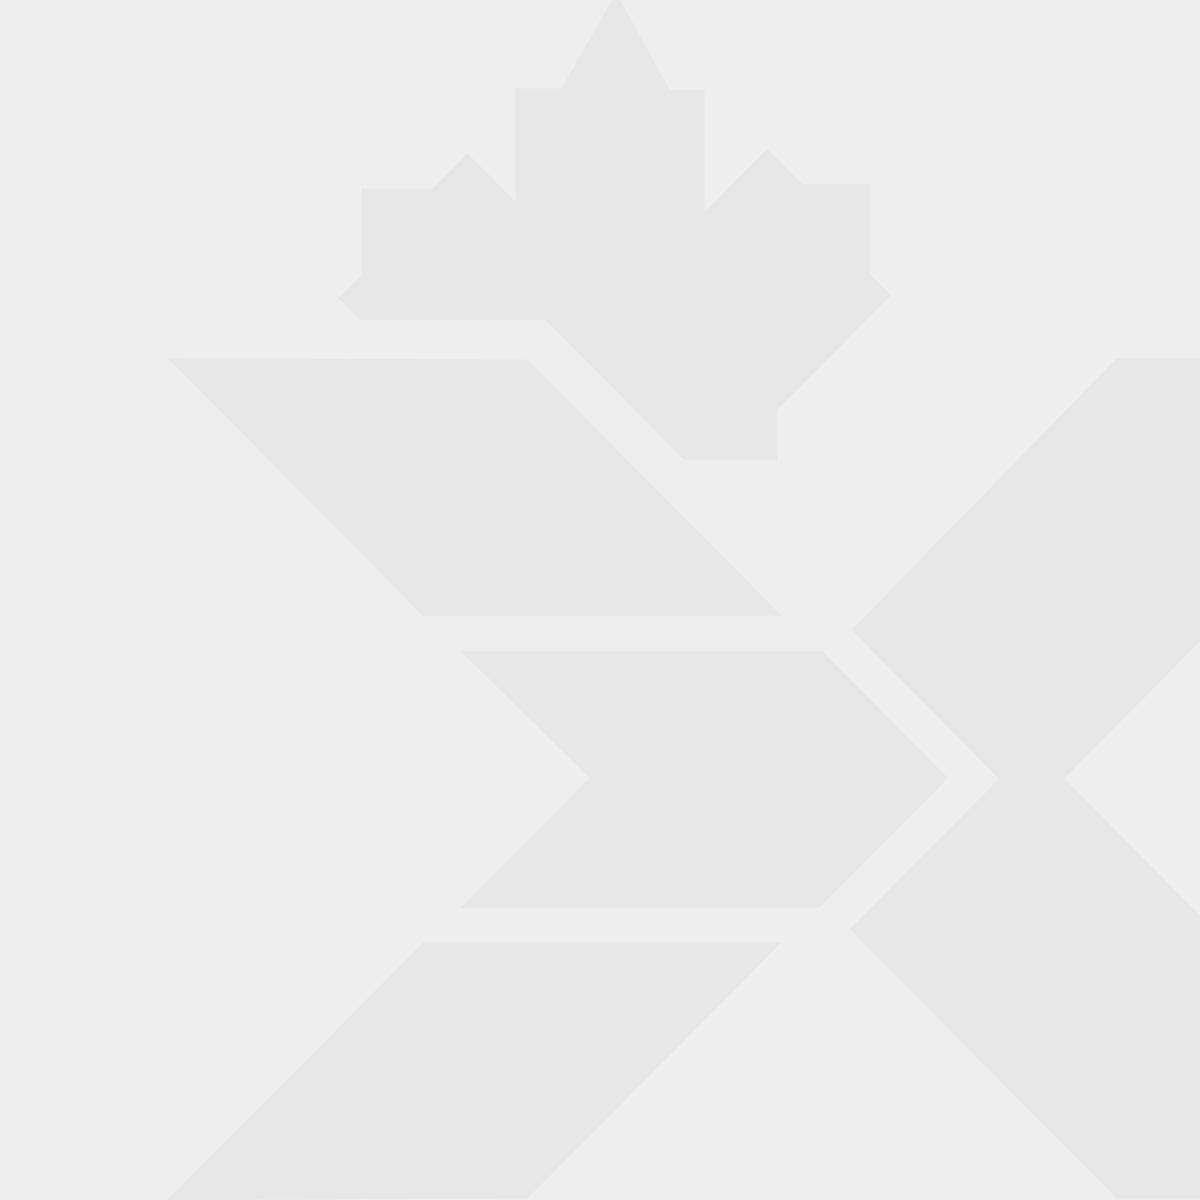 The Royal Canadian Legion Korean War Commemorative Pin